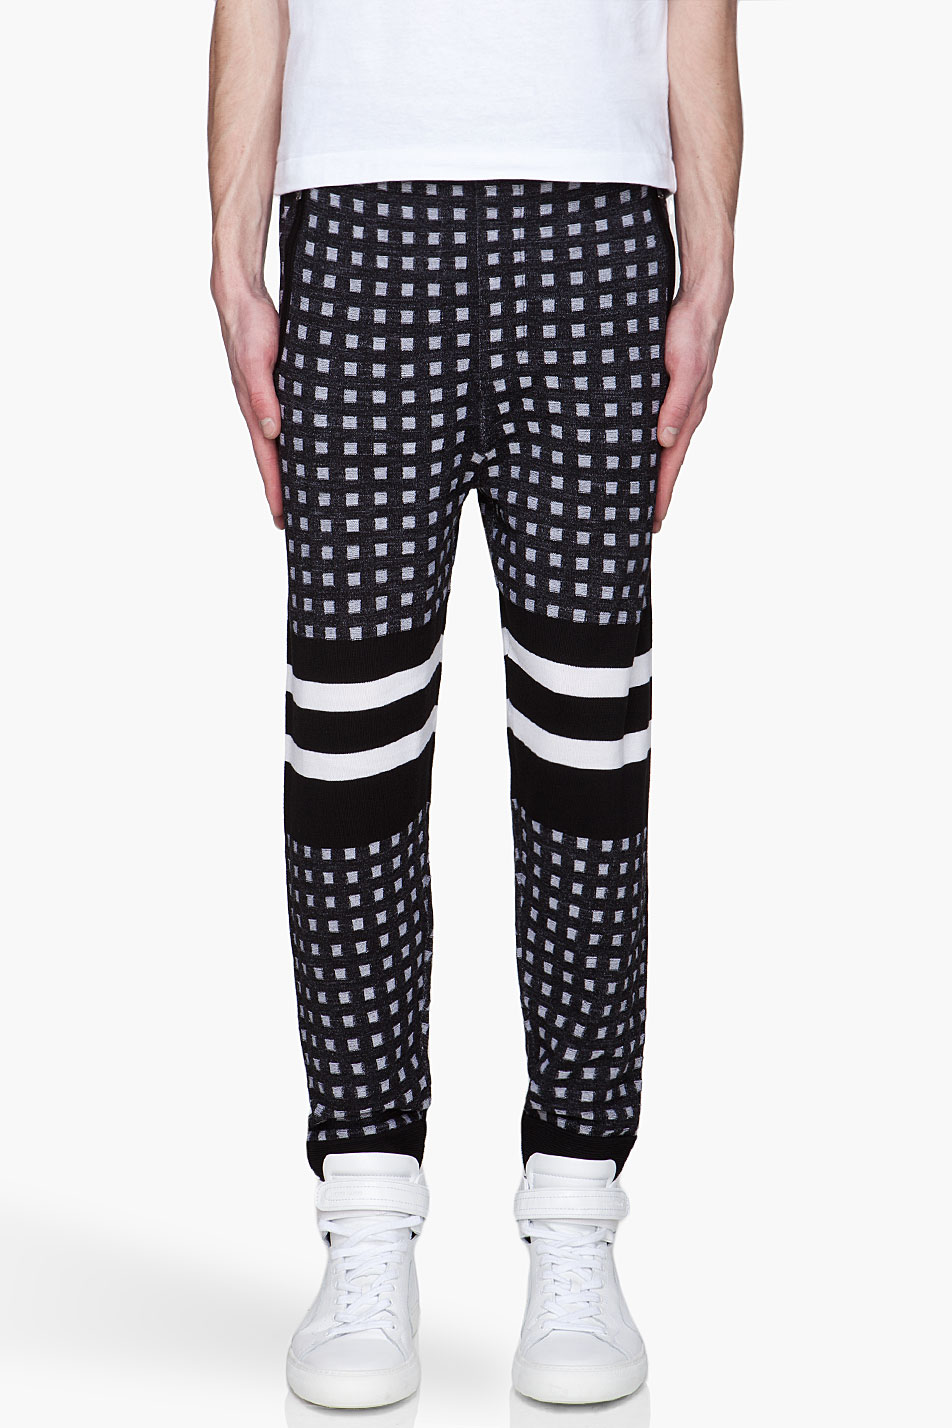 3.1 Phillip Lim trousers.jpg